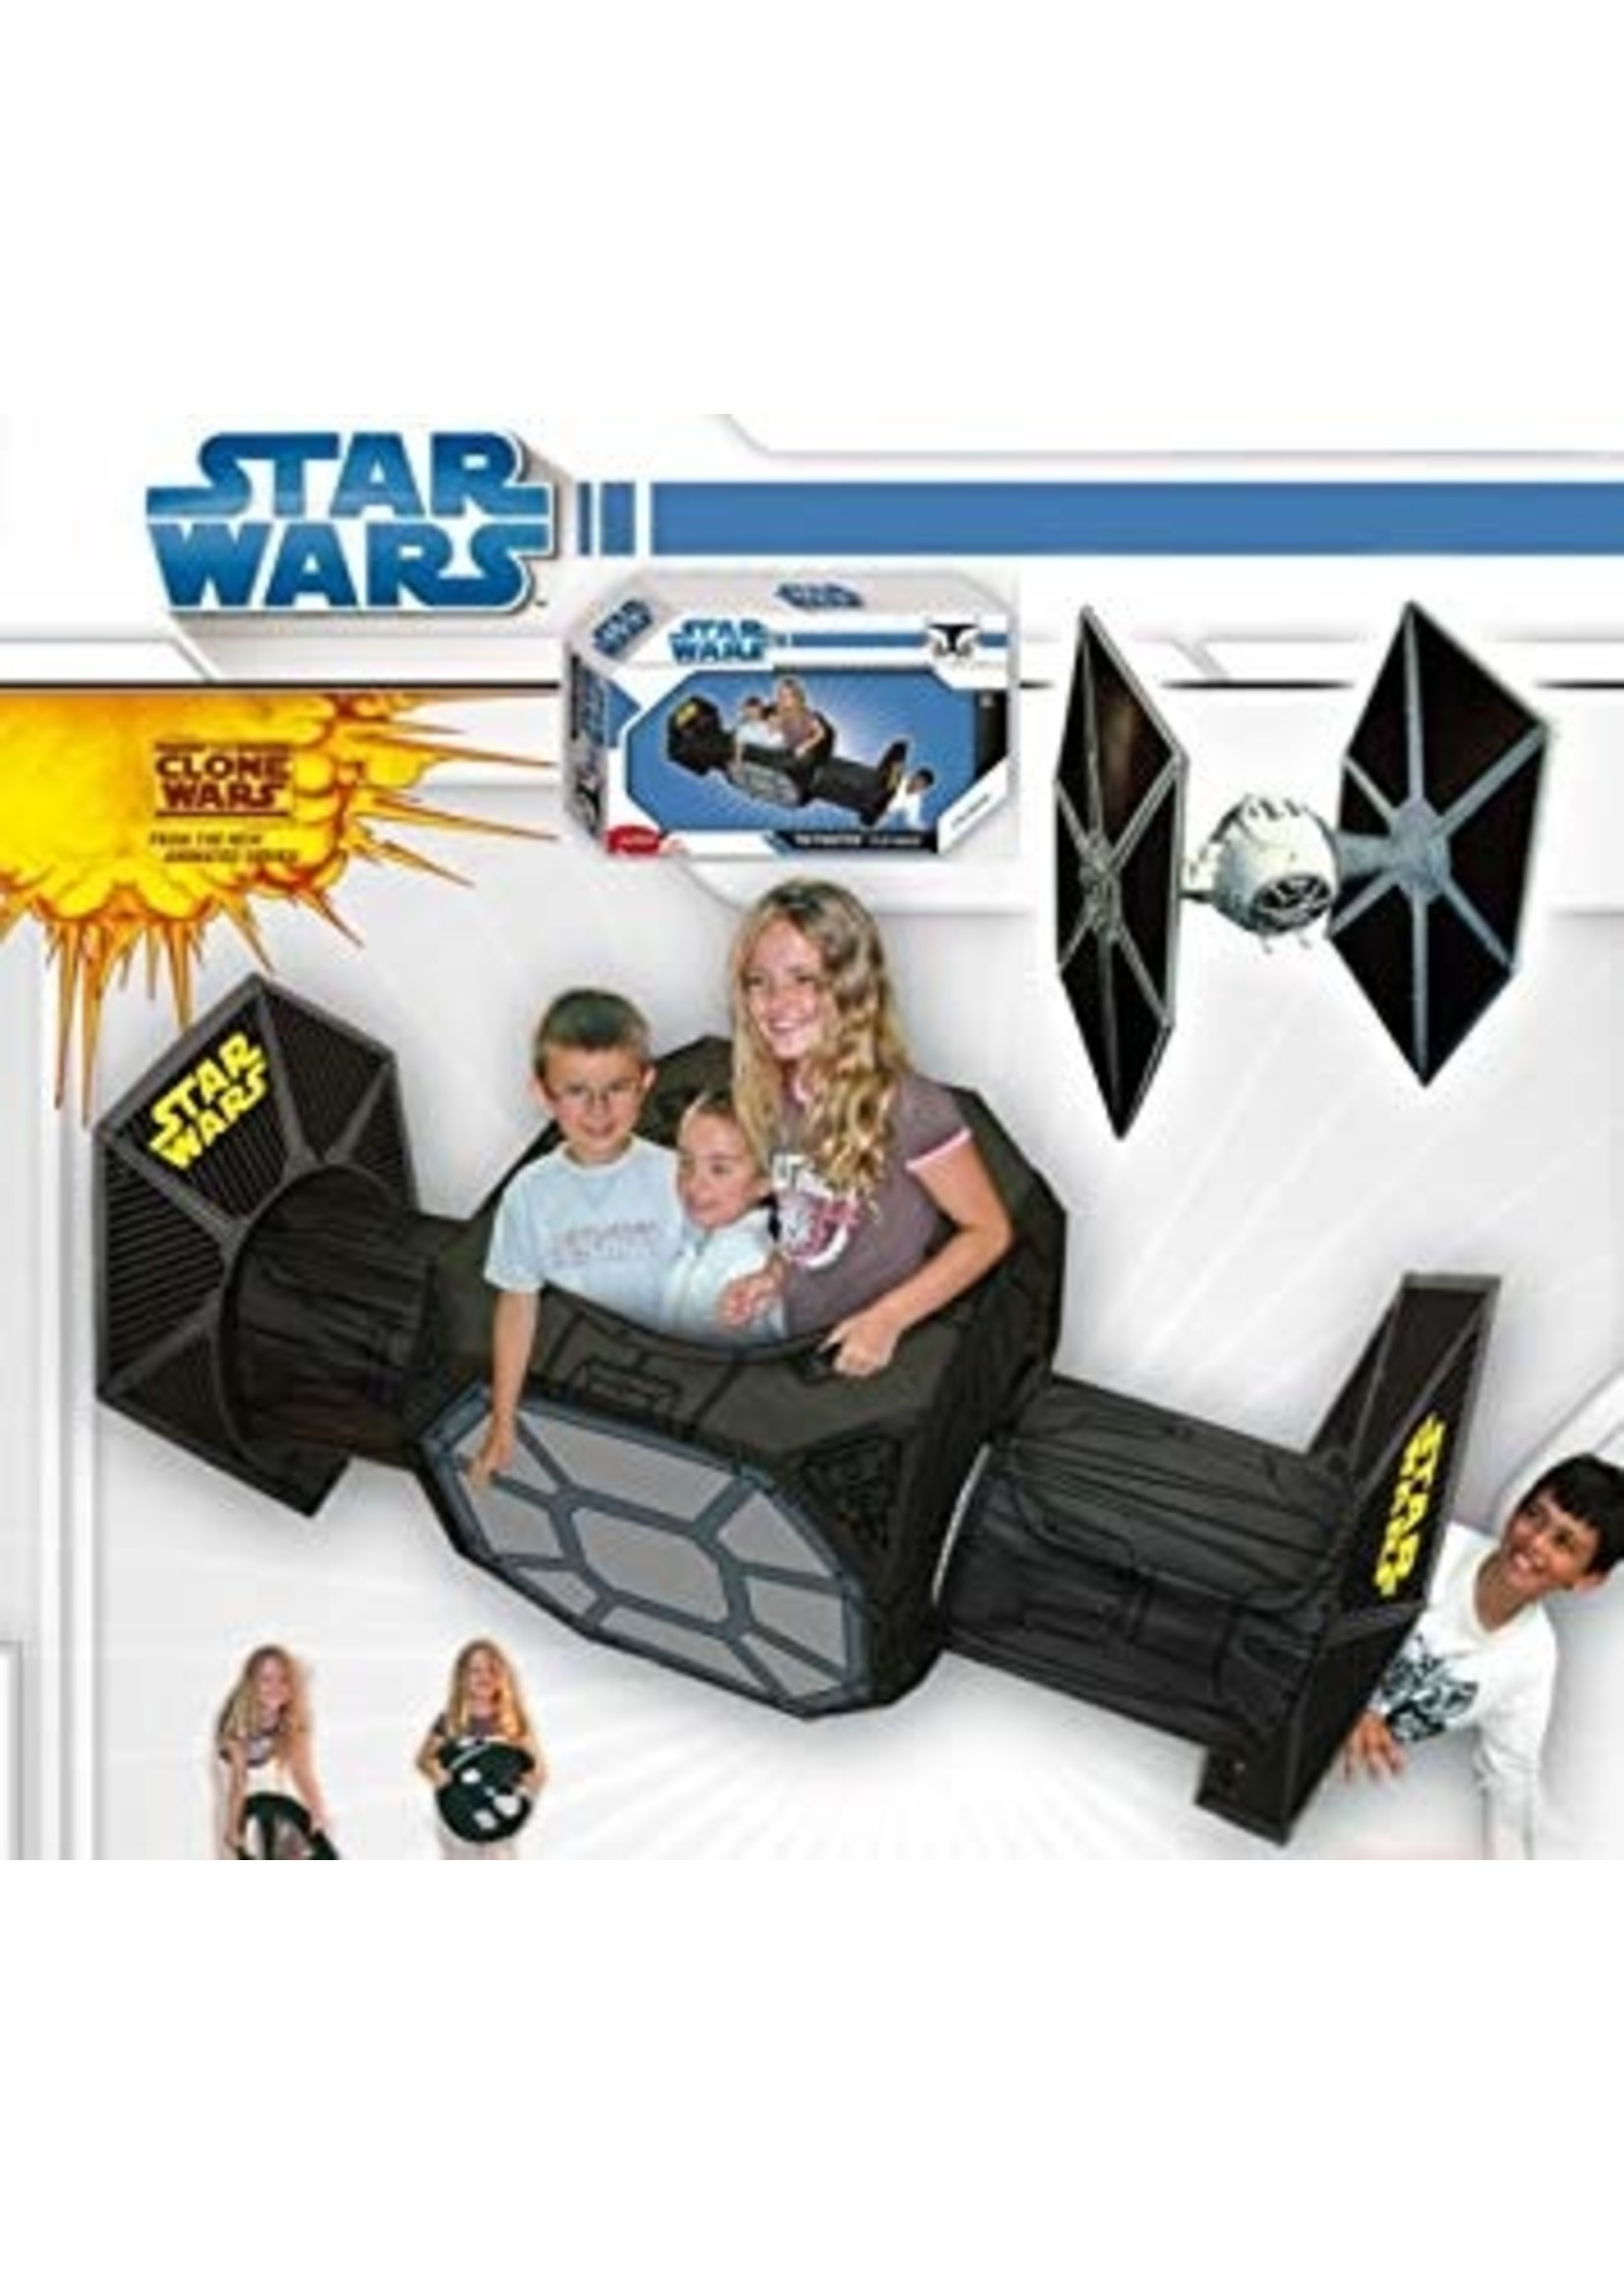 Star Wars Eolo Star Wars Tie-Fighter Speelhuis